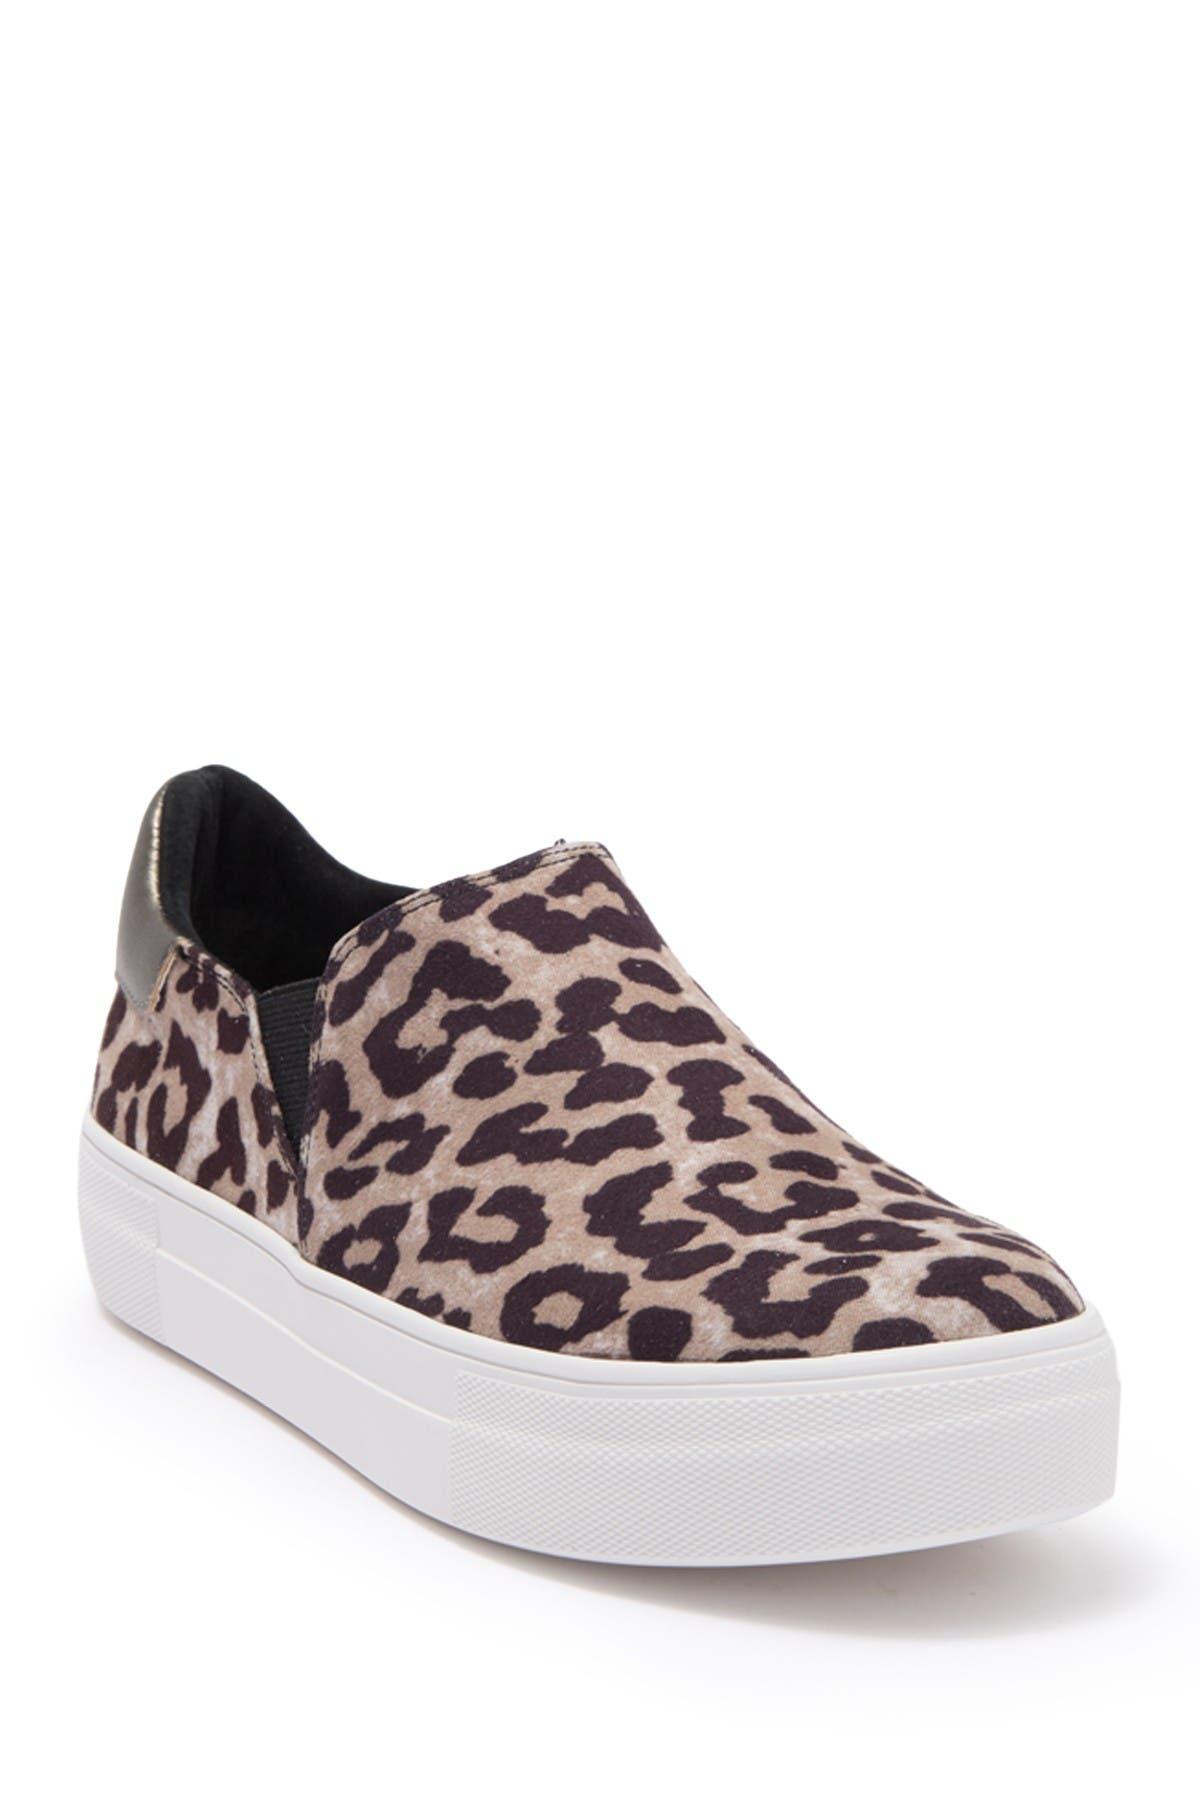 Image of 14th & Union Selma Leopard Print Slip-On Sneaker